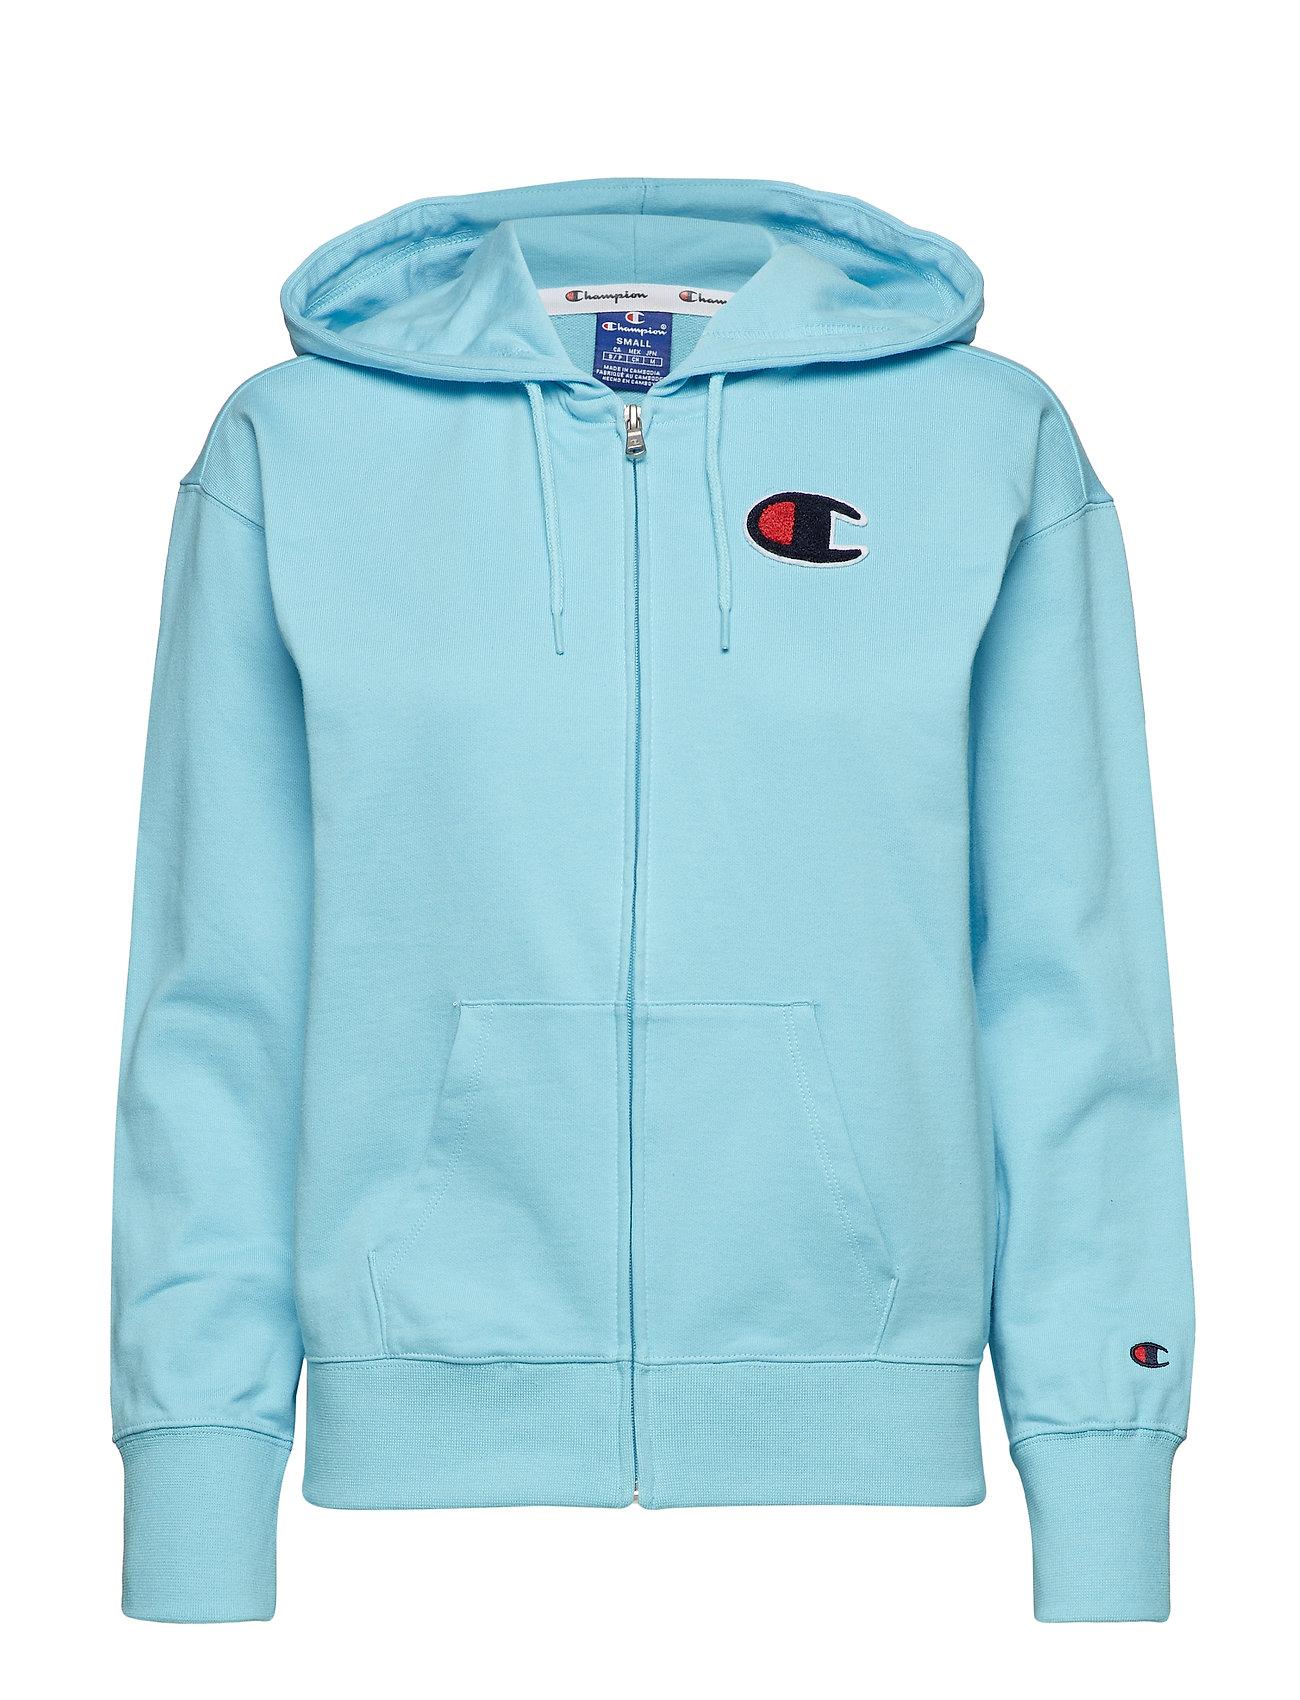 Rochester Hooded Full BlueChampion Zip Sweatshirtbright H2DEY9IeW